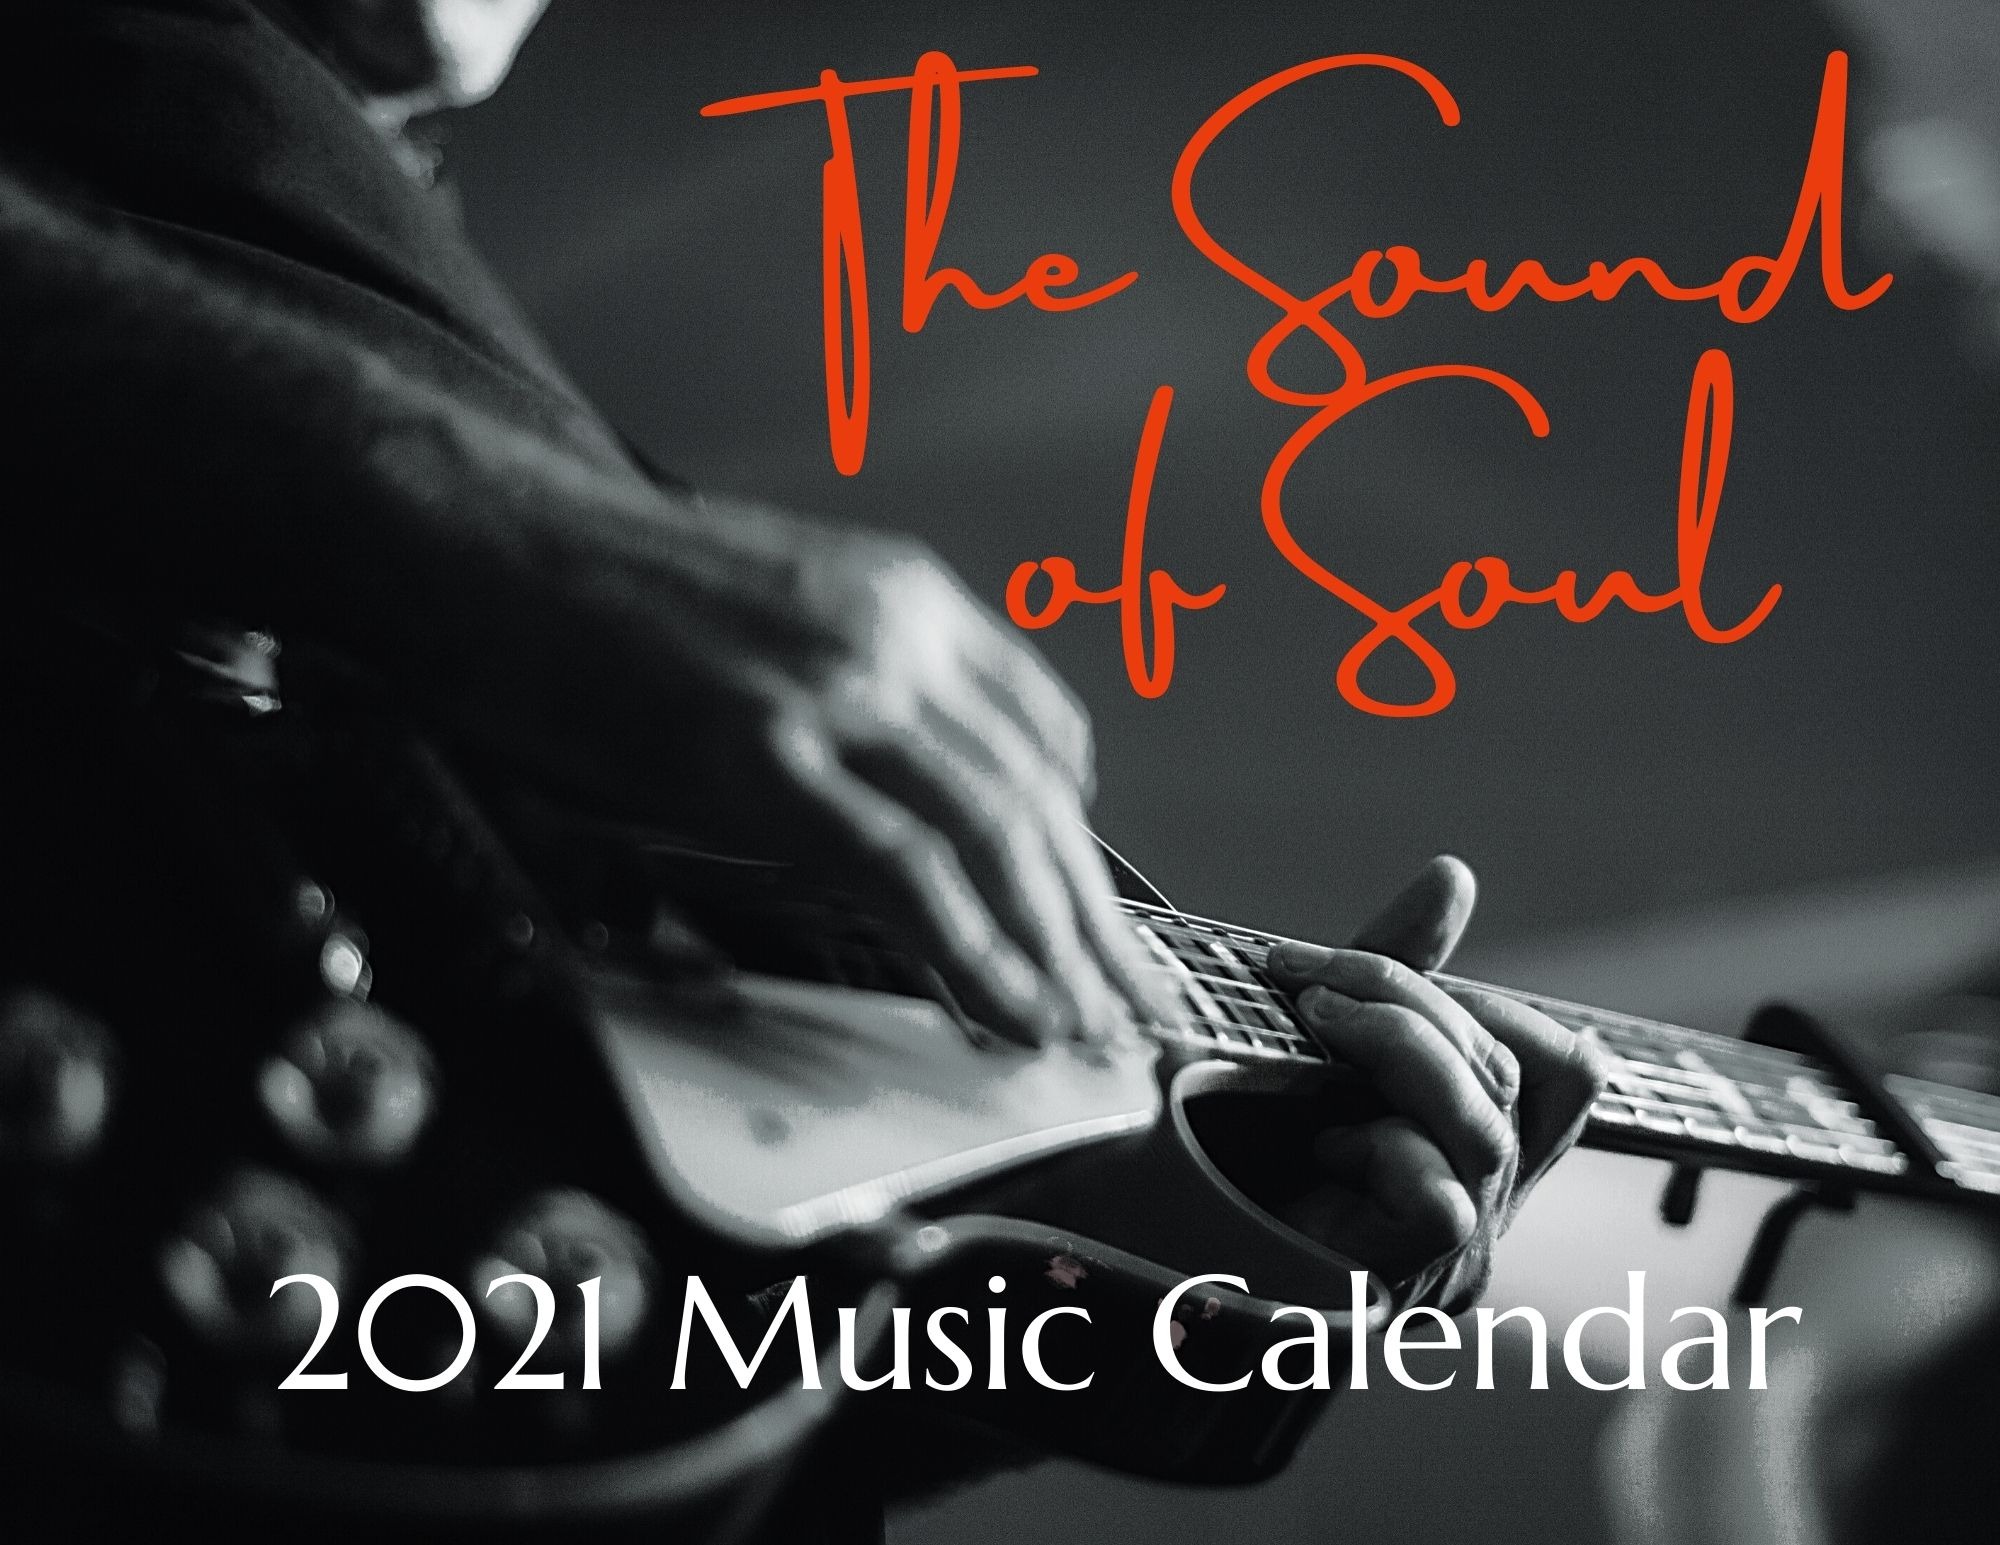 2021 Music Calendar